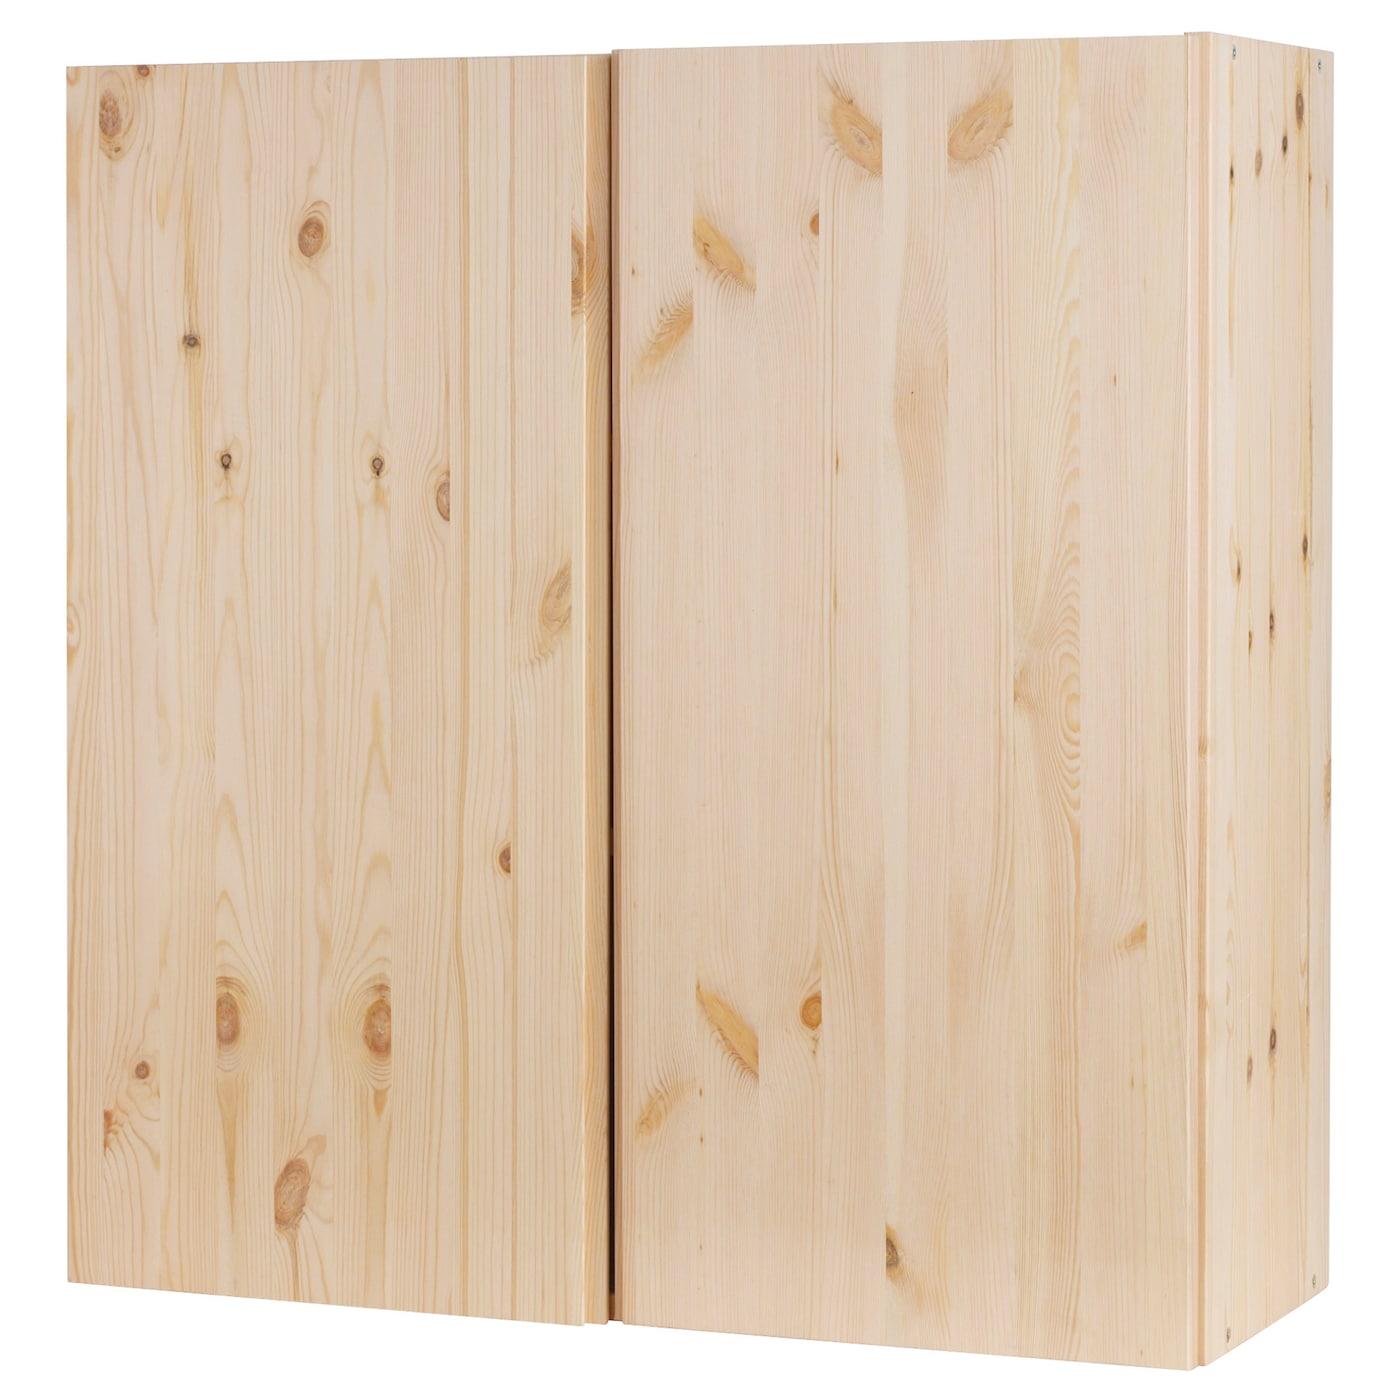 Natural Unfinished Pine: IVAR Cabinet Pine 80 X 30 X 83 Cm